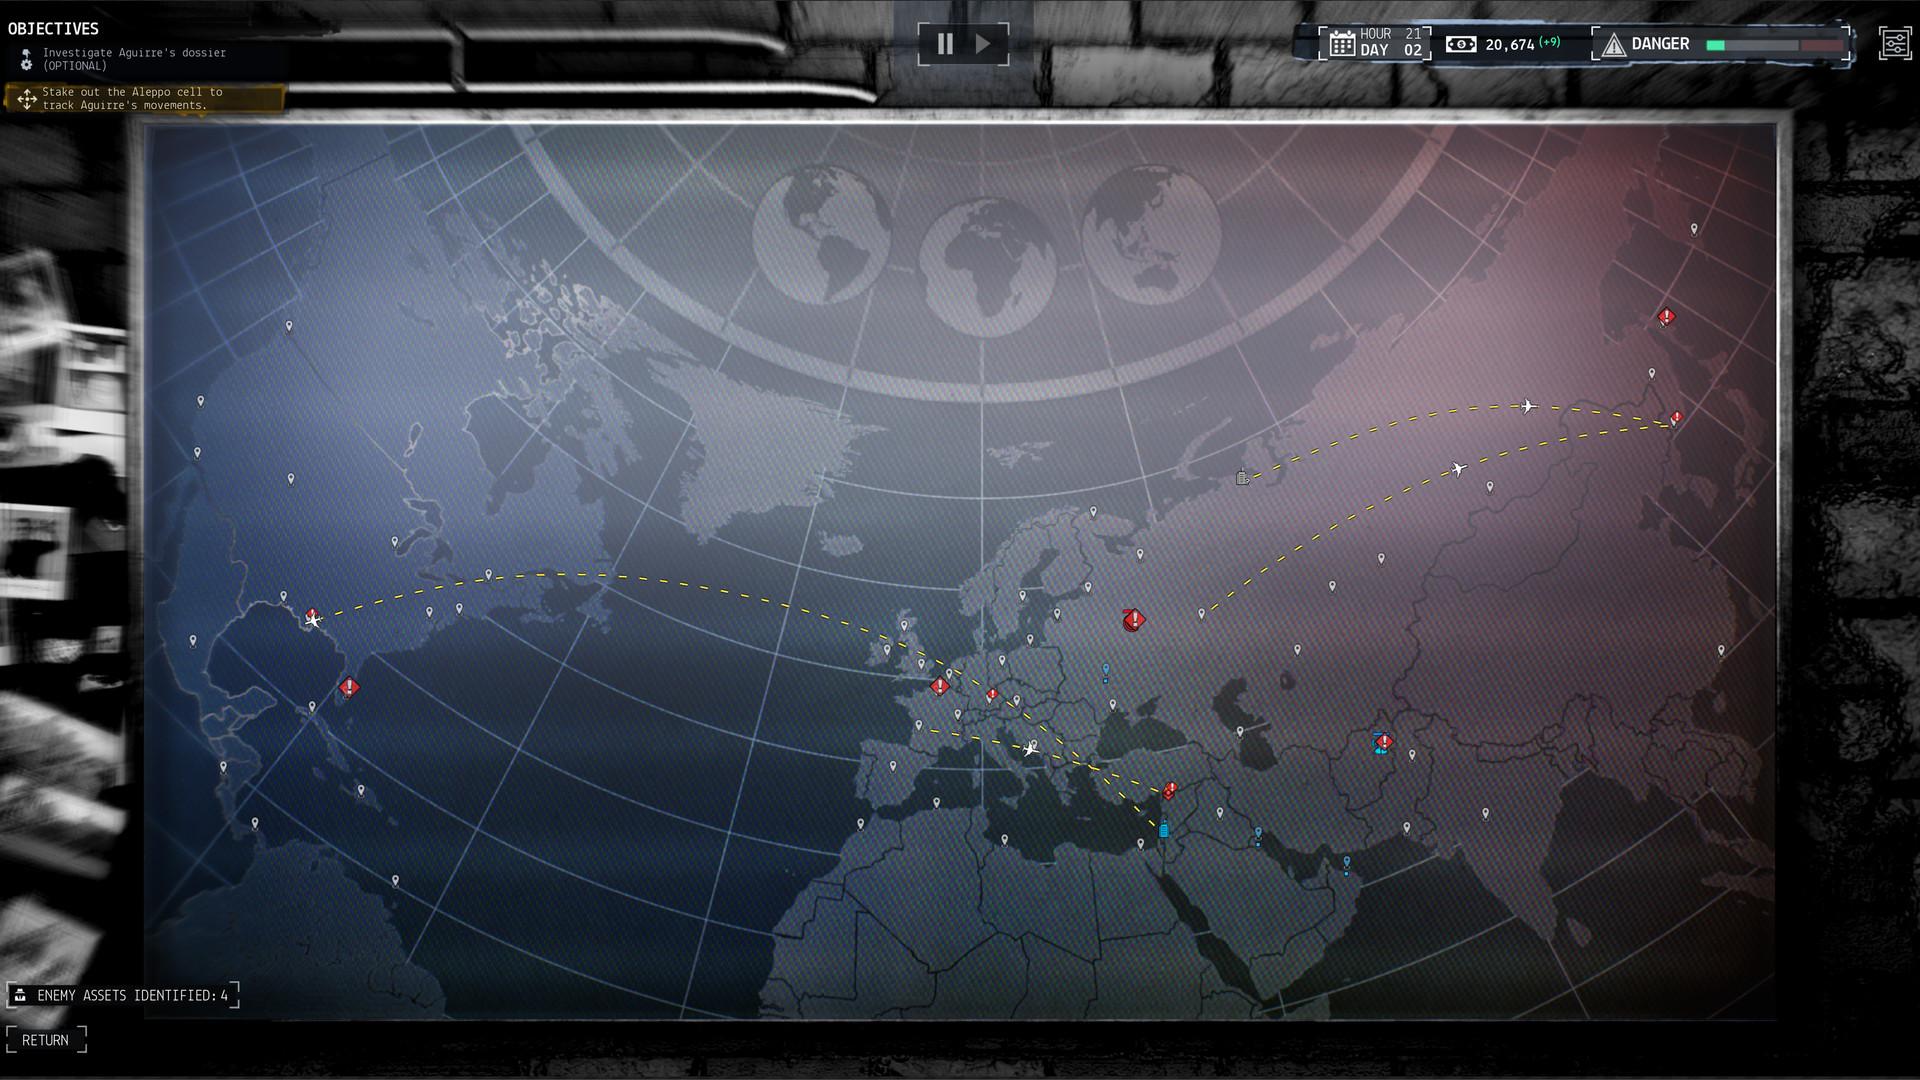 幽灵教义/Phantom Doctrine(V1.1.0)插图5